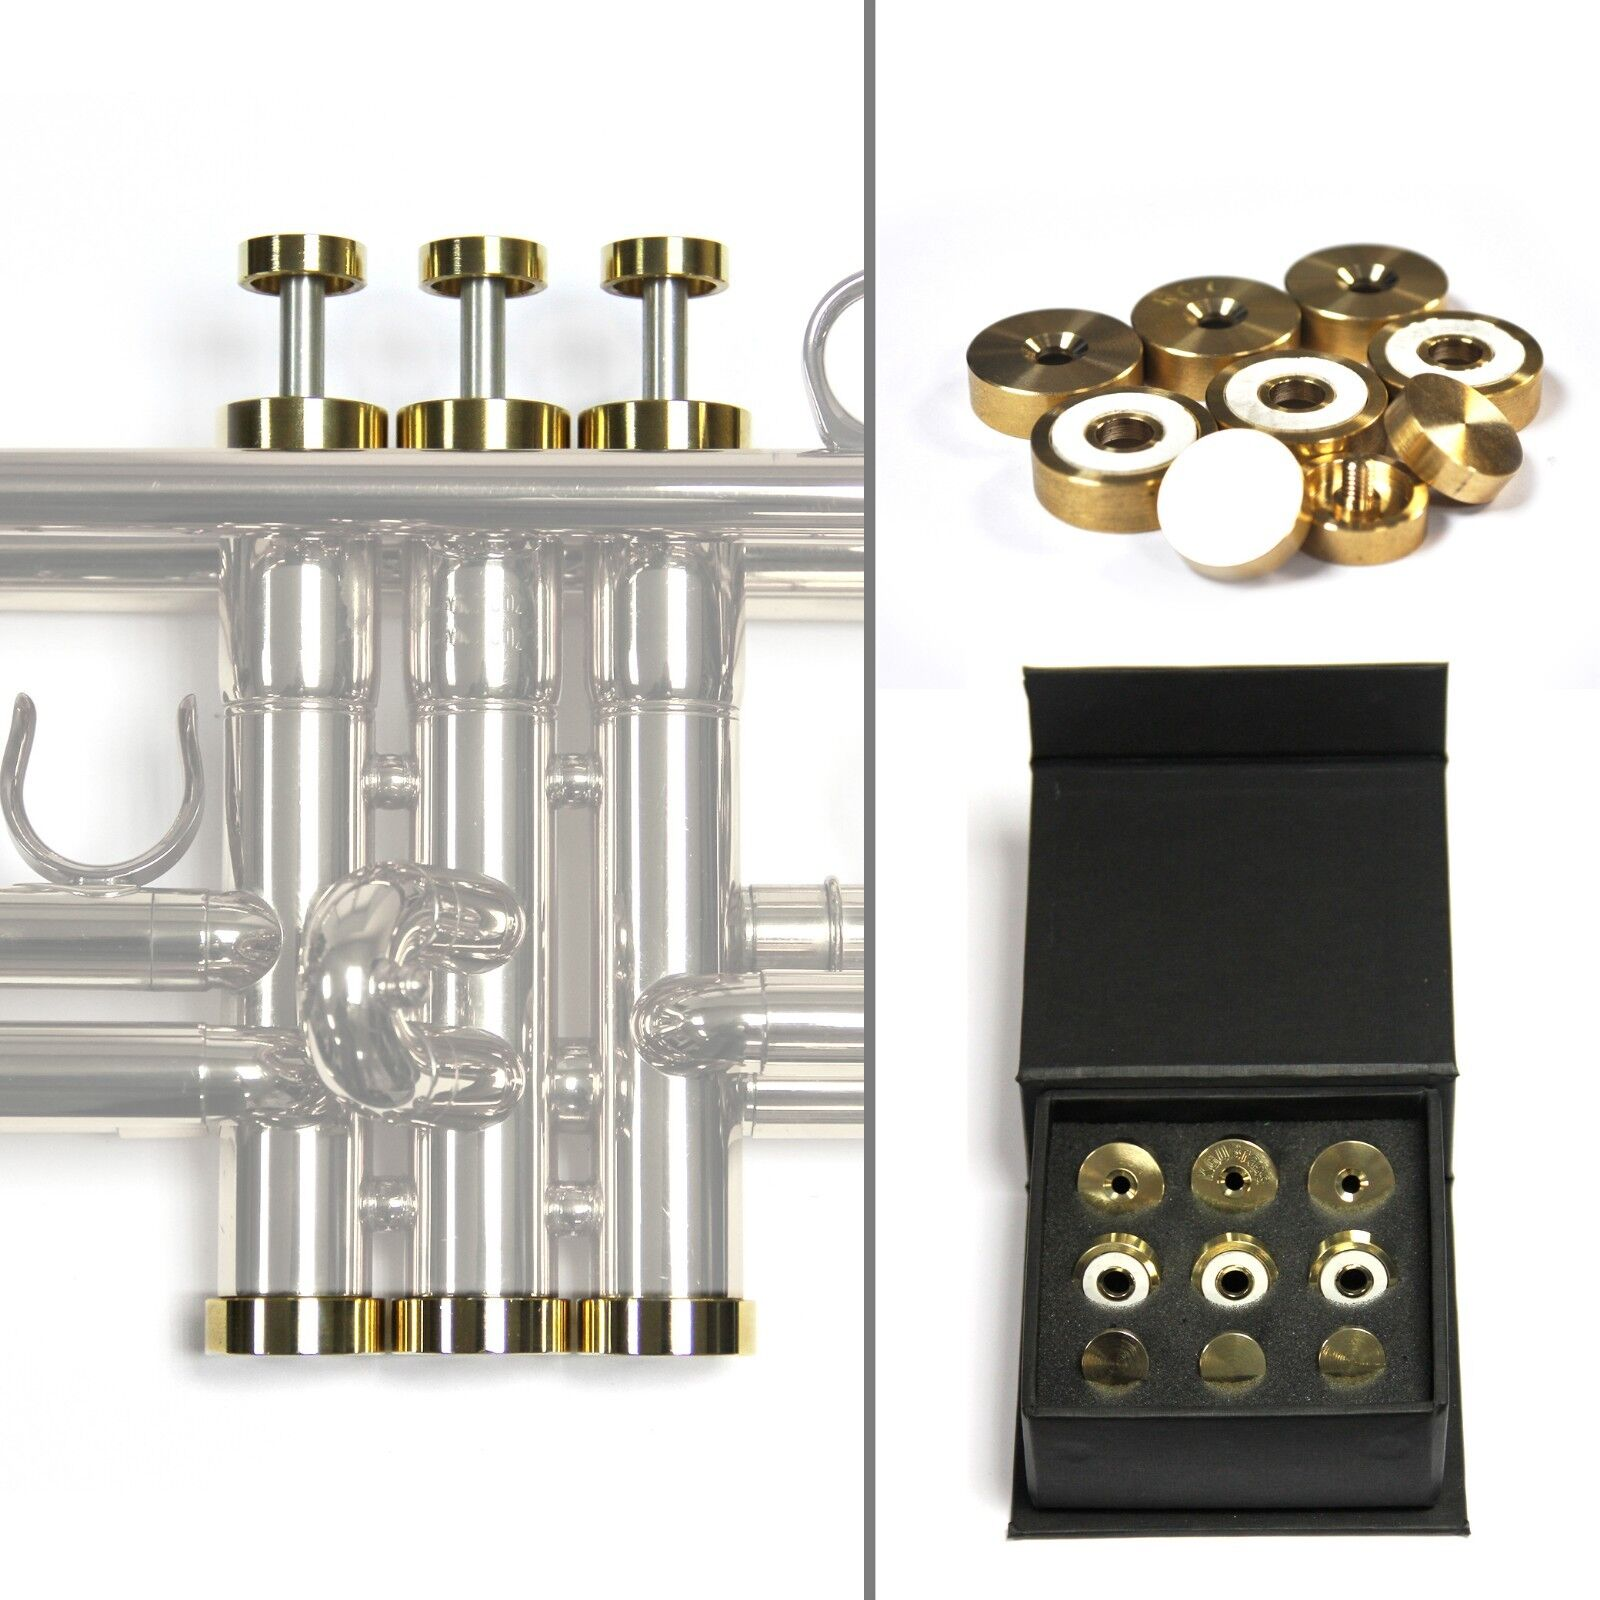 HEAVY, Raw Brass Trumpet Trim Kit for improving the sound Custom made KGUBrass For all Bach Stradivarius Trumpet